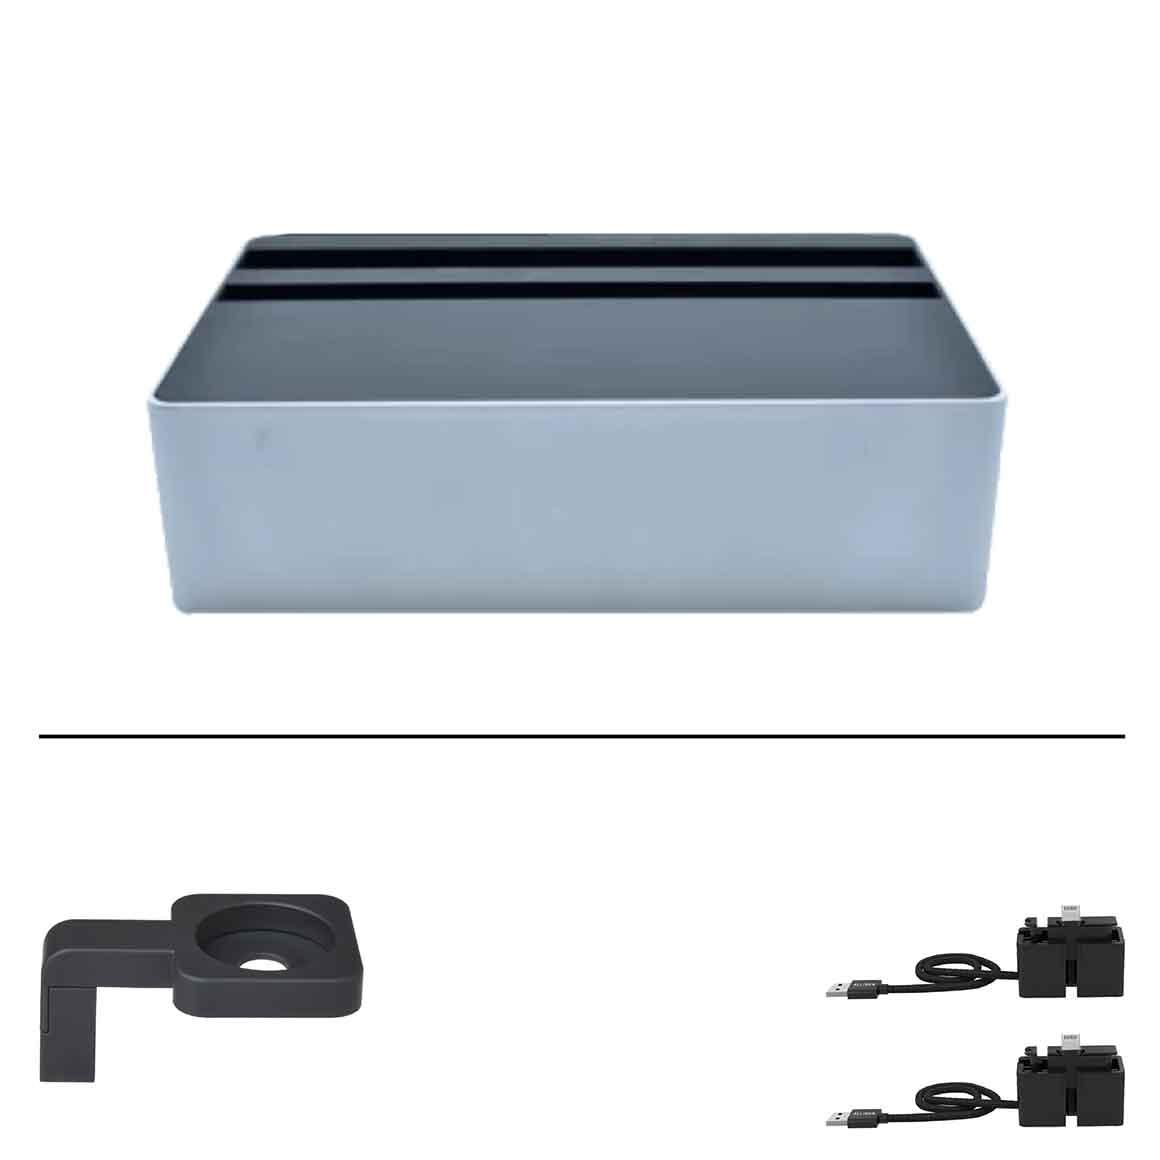 ALLDOCK - Medium Apple Package - HybridX Compact Silver Alu/Black + 2x MFi Cable + Black Apple Watch Mount   Trada Marketplace